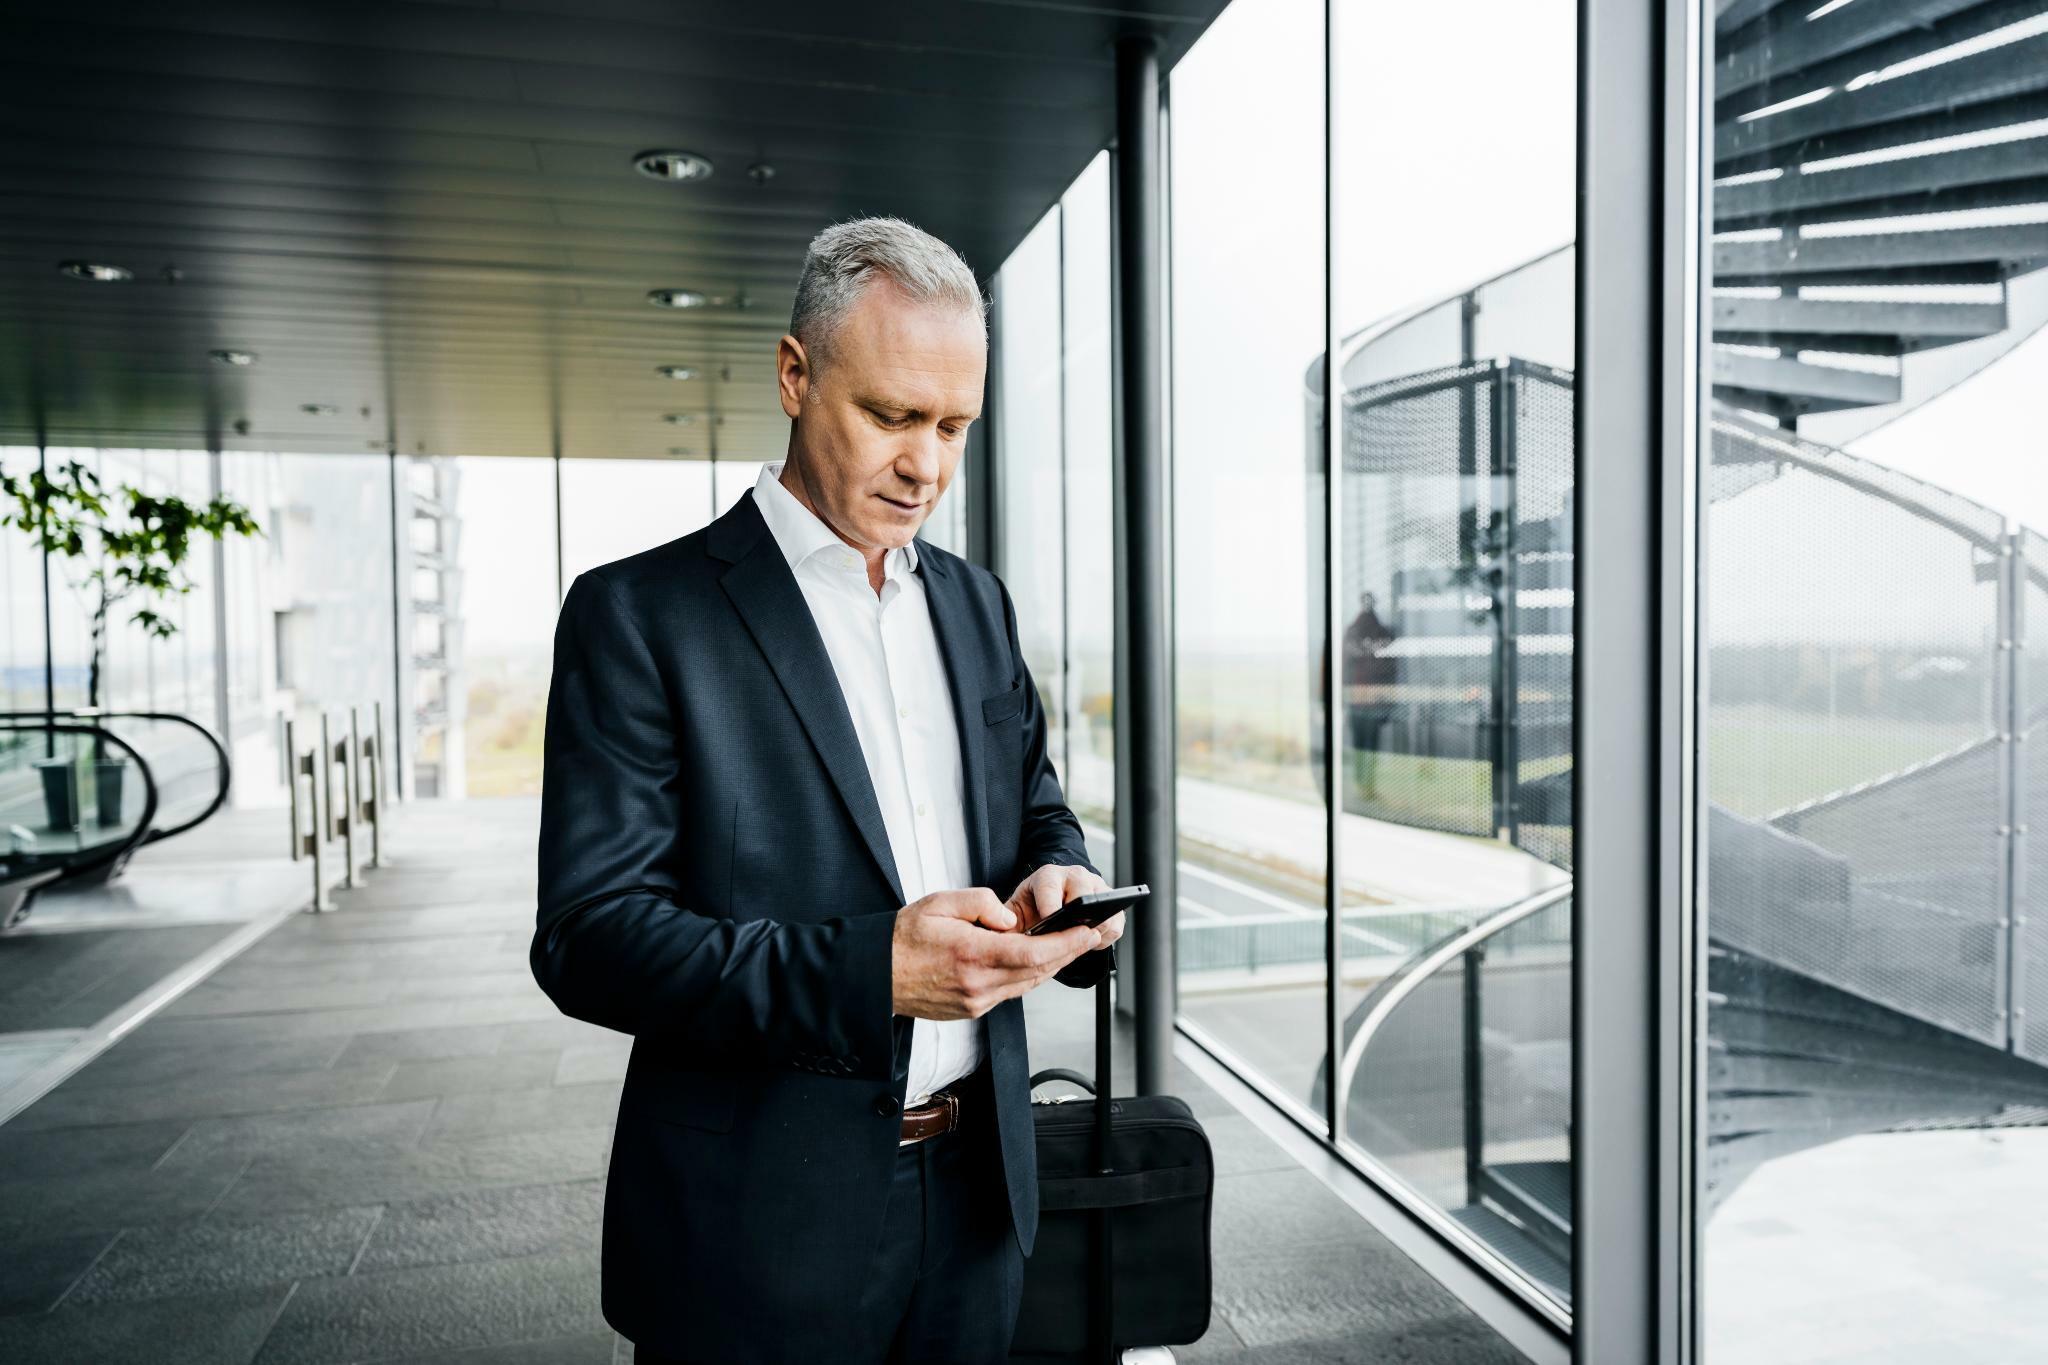 Smartphone als Personalausweis: So soll die digitale Verwaltung gelingen